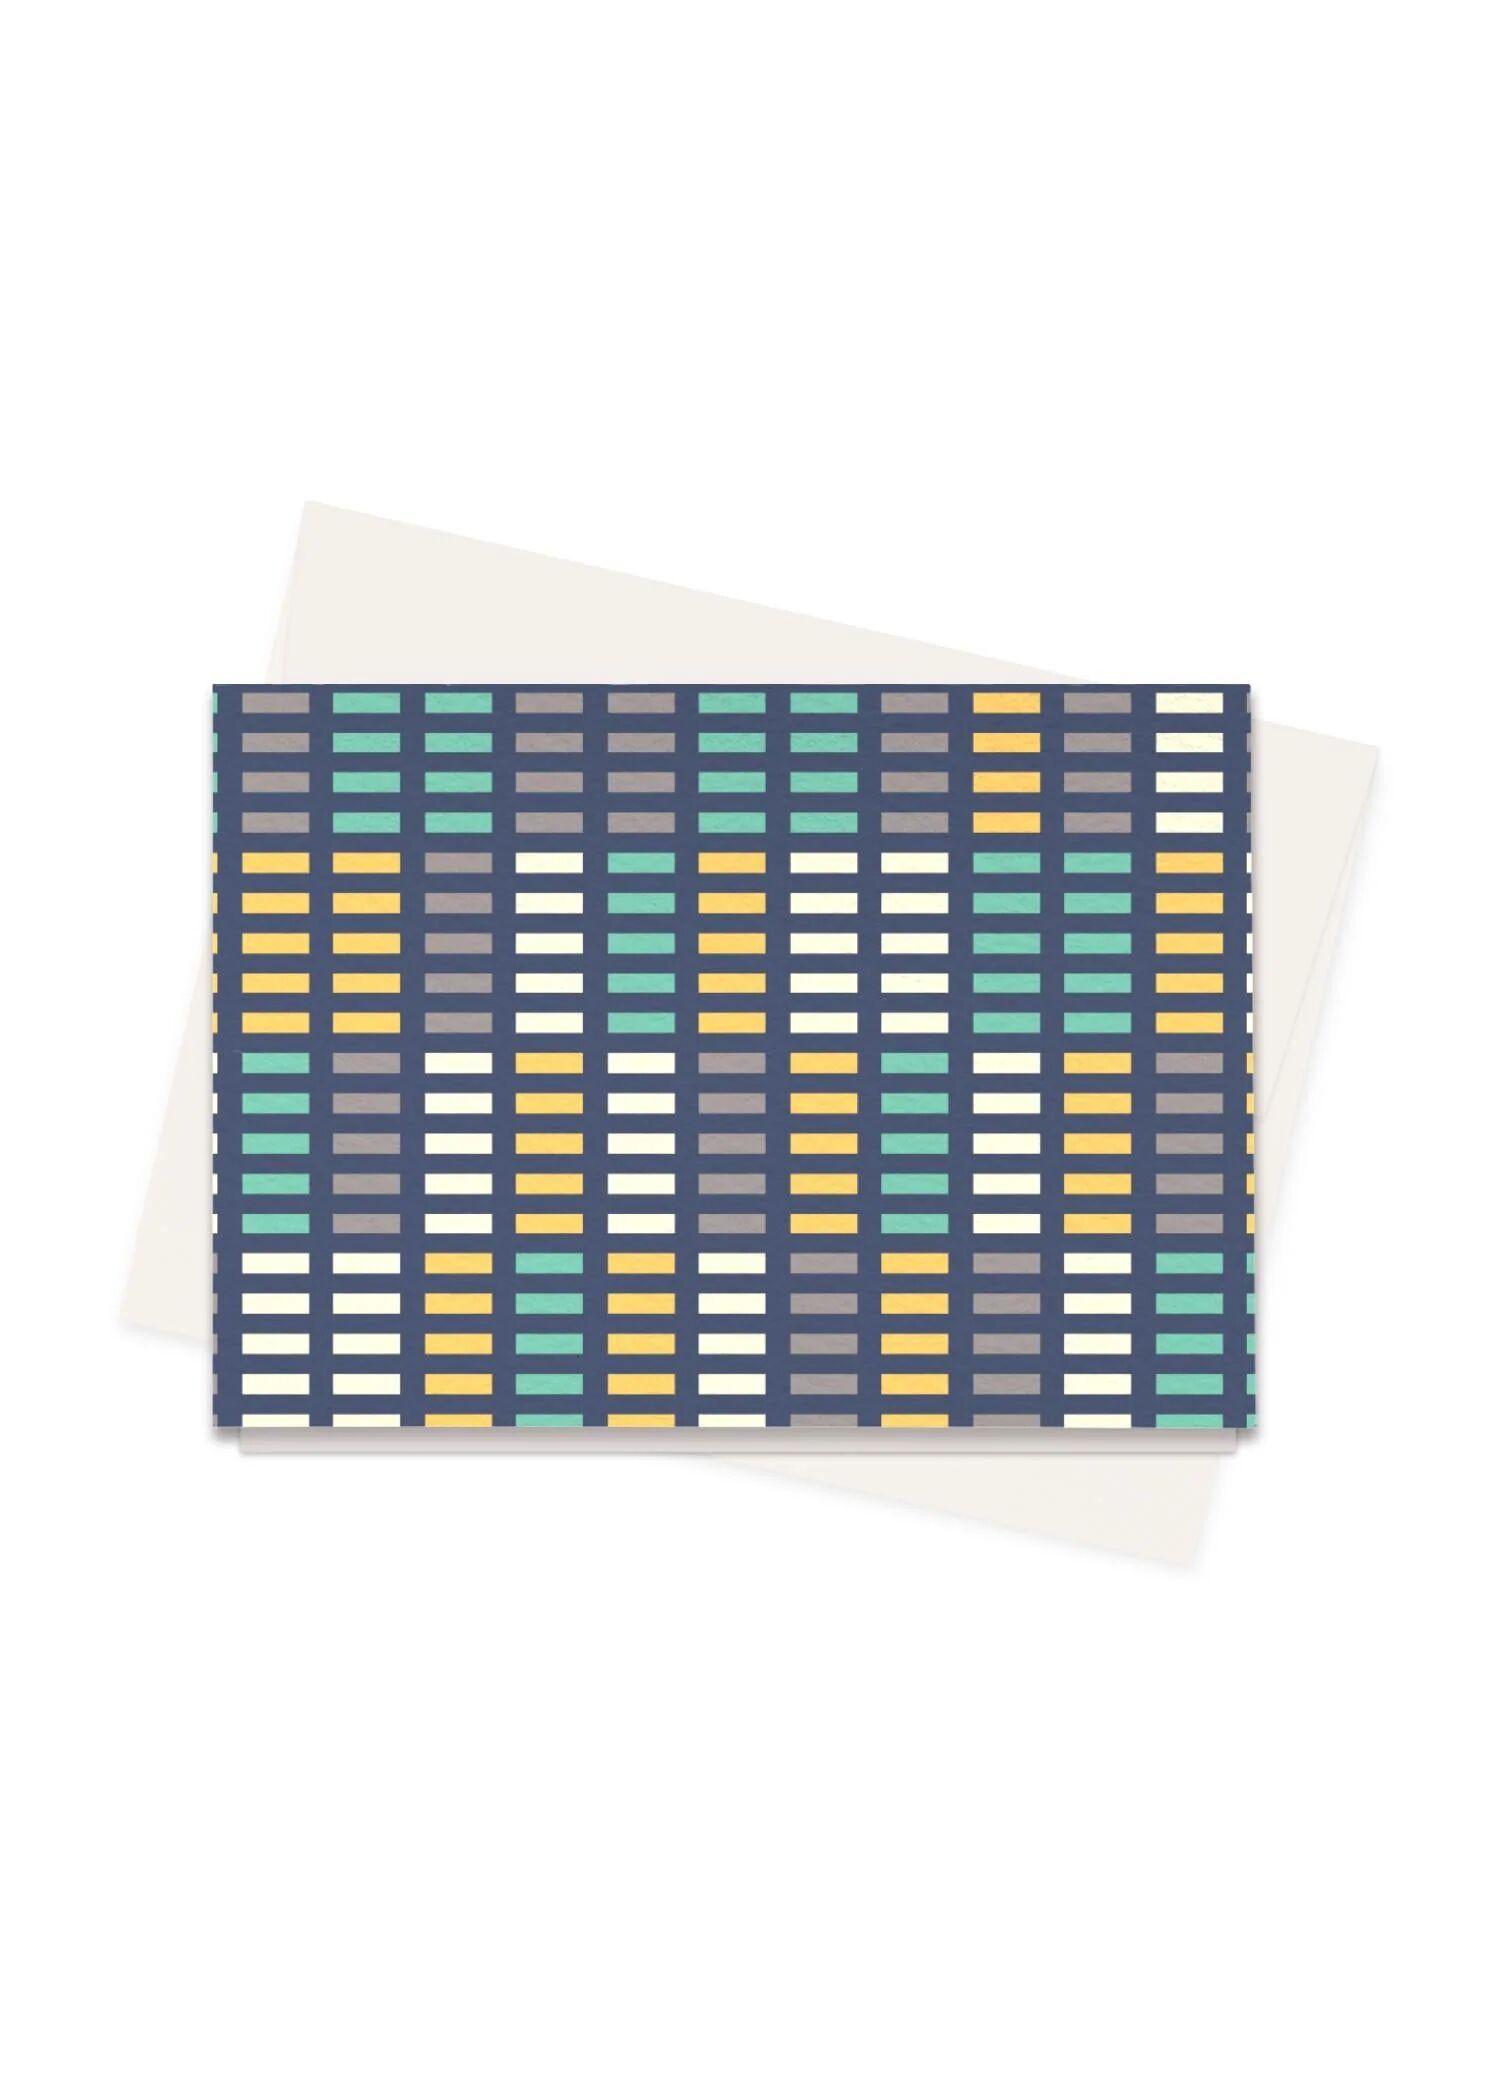 VIDA Greeting Cards Set - Music Equalizer by VIDA Original Artist  - Size: Set of 8